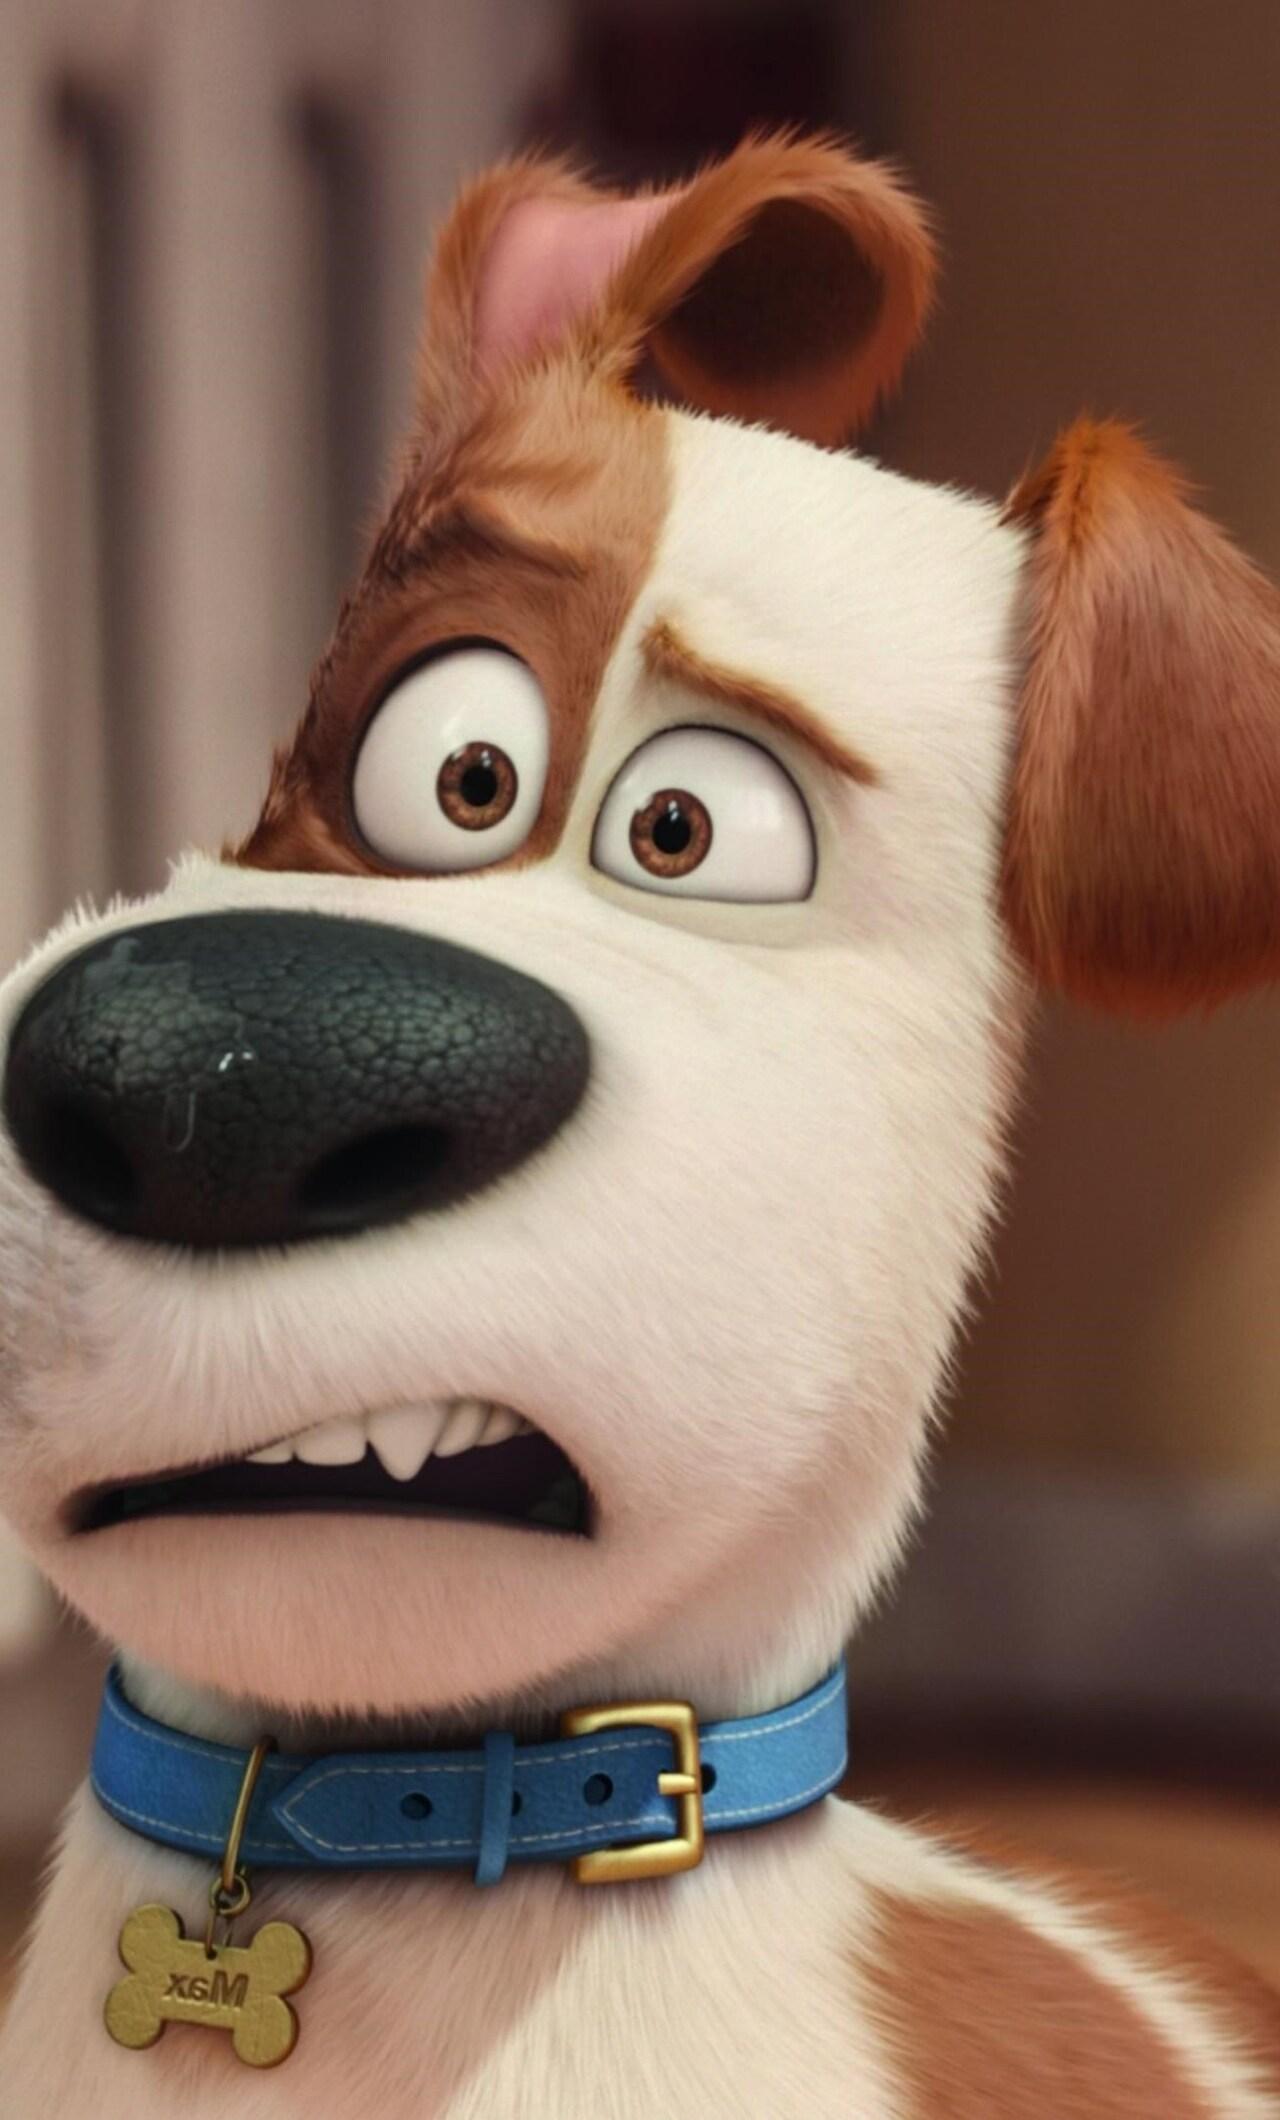 the-secrete-life-of-pets-movie-hd.jpg